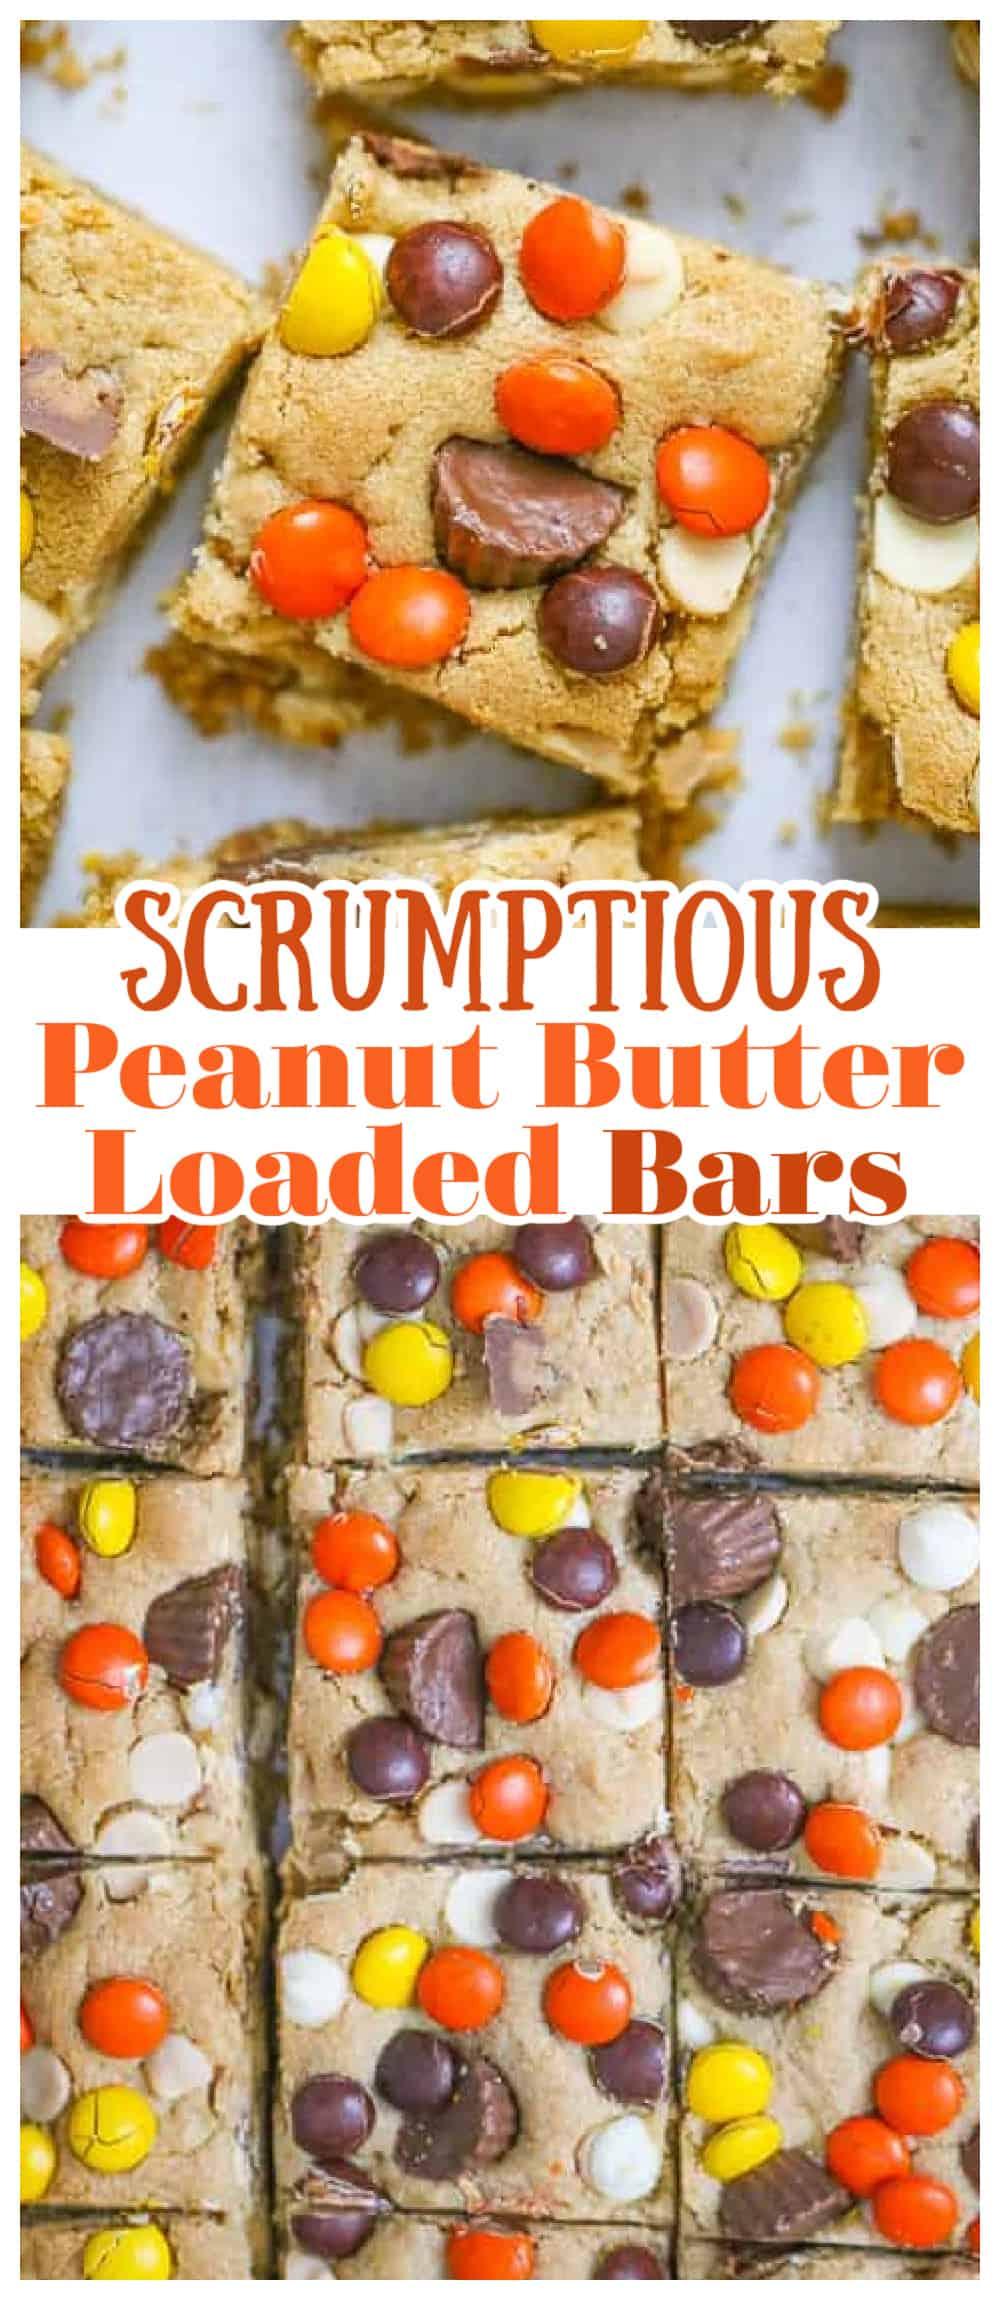 Scrumptious Peanut Butter Loaded Bars